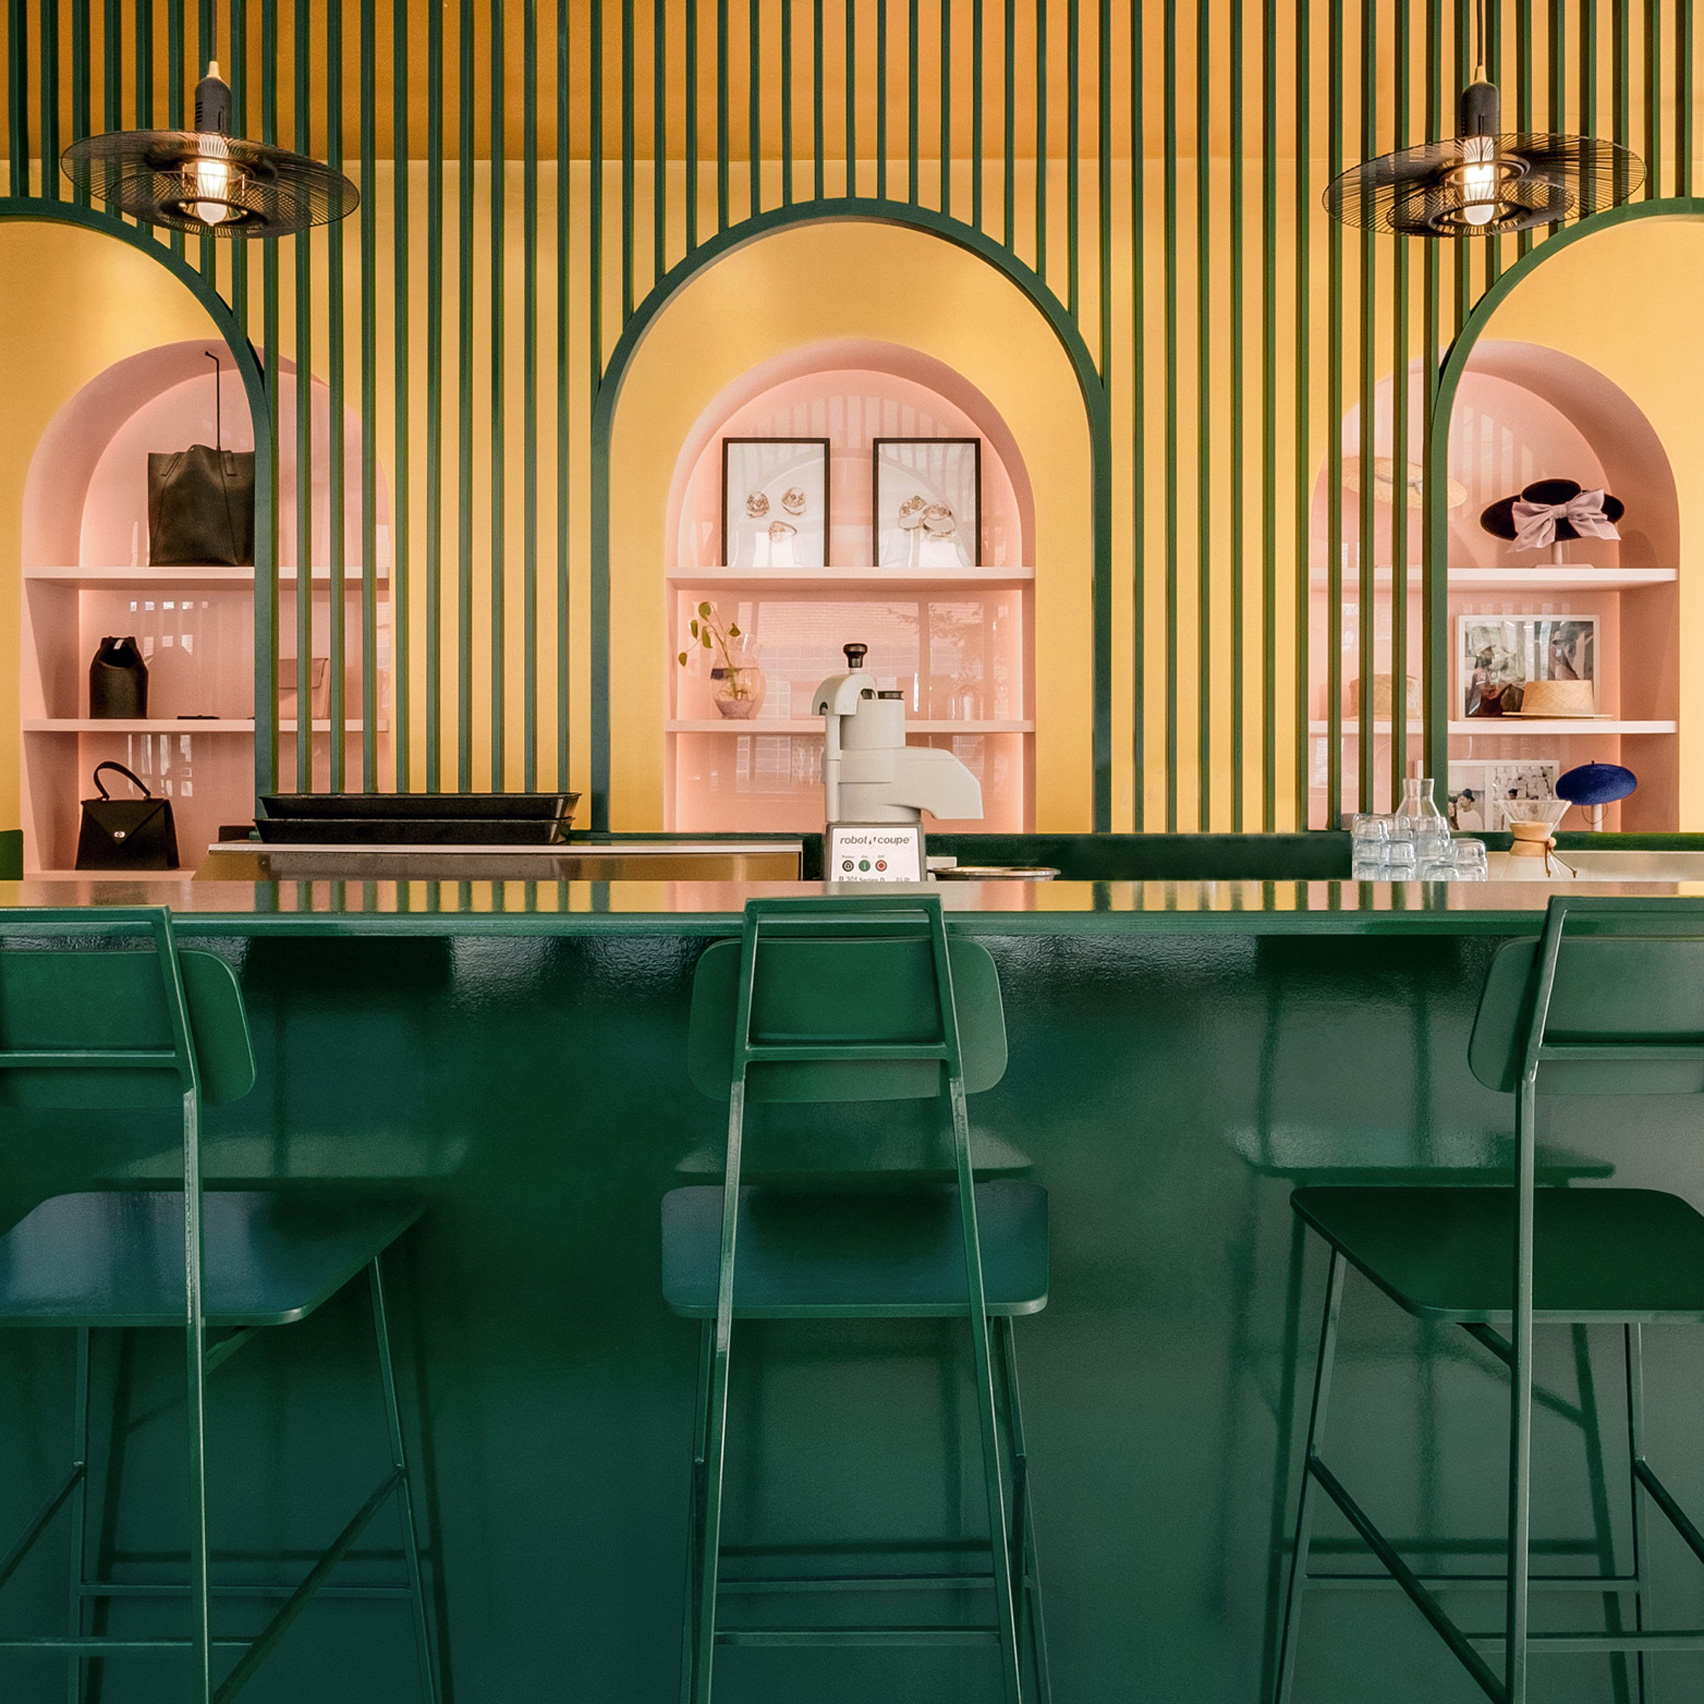 Pastel Rita by Appareil Architecture